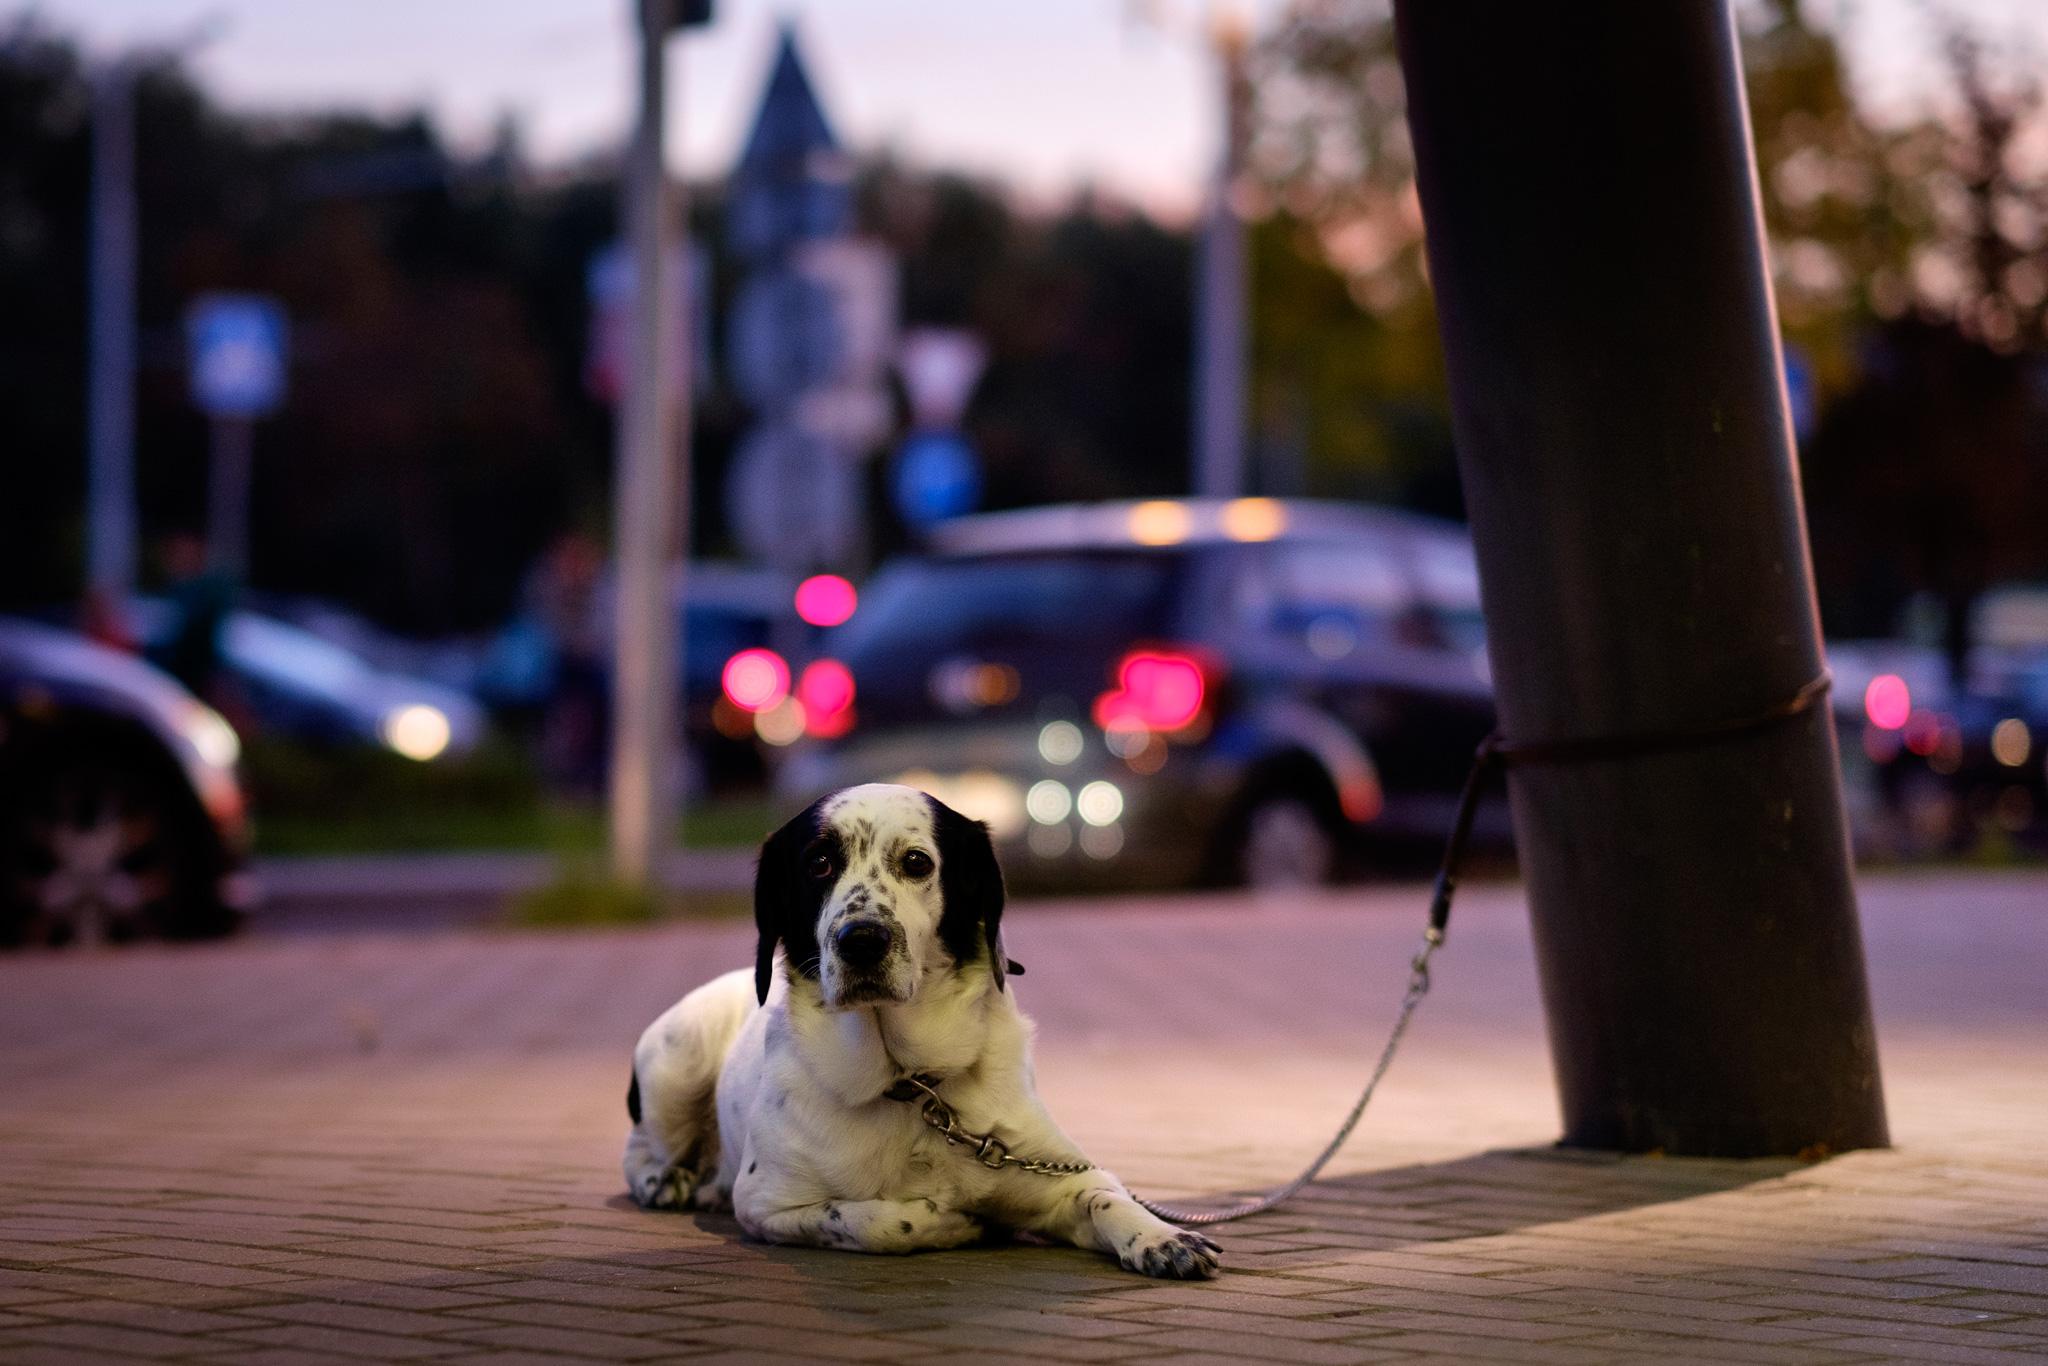 Shopping mall dog portrait